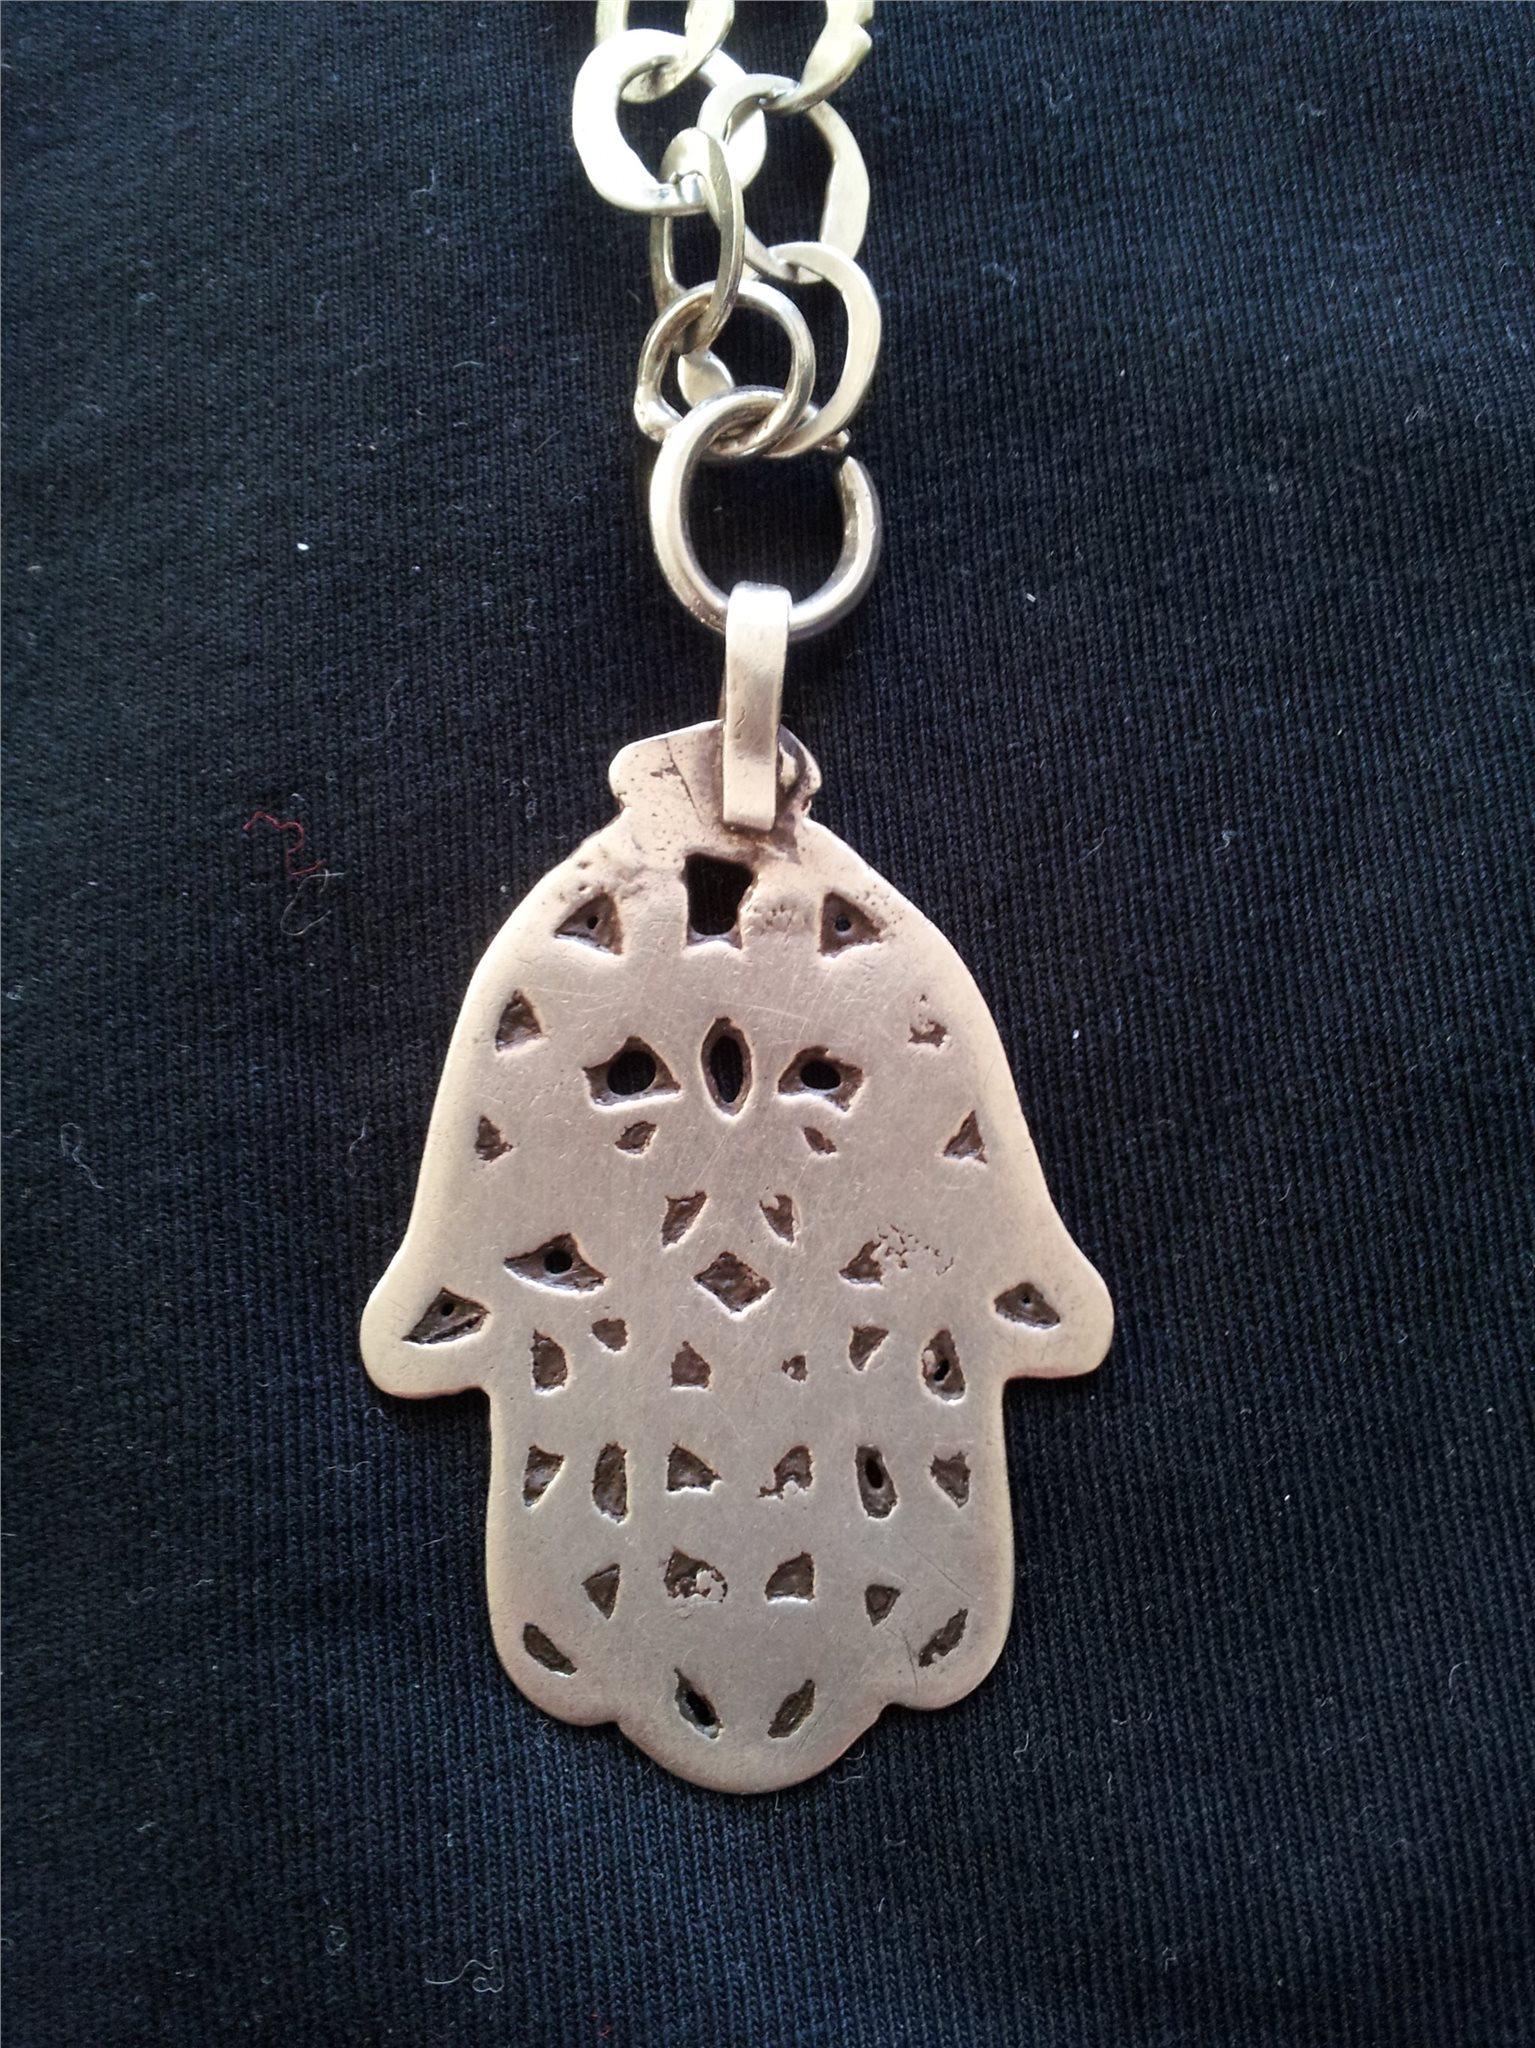 Halsband Hamsa Fatimas Hand Muslimsk Symbol - 6.. (328169997) ᐈ Köp ... 0e3134b38b65a